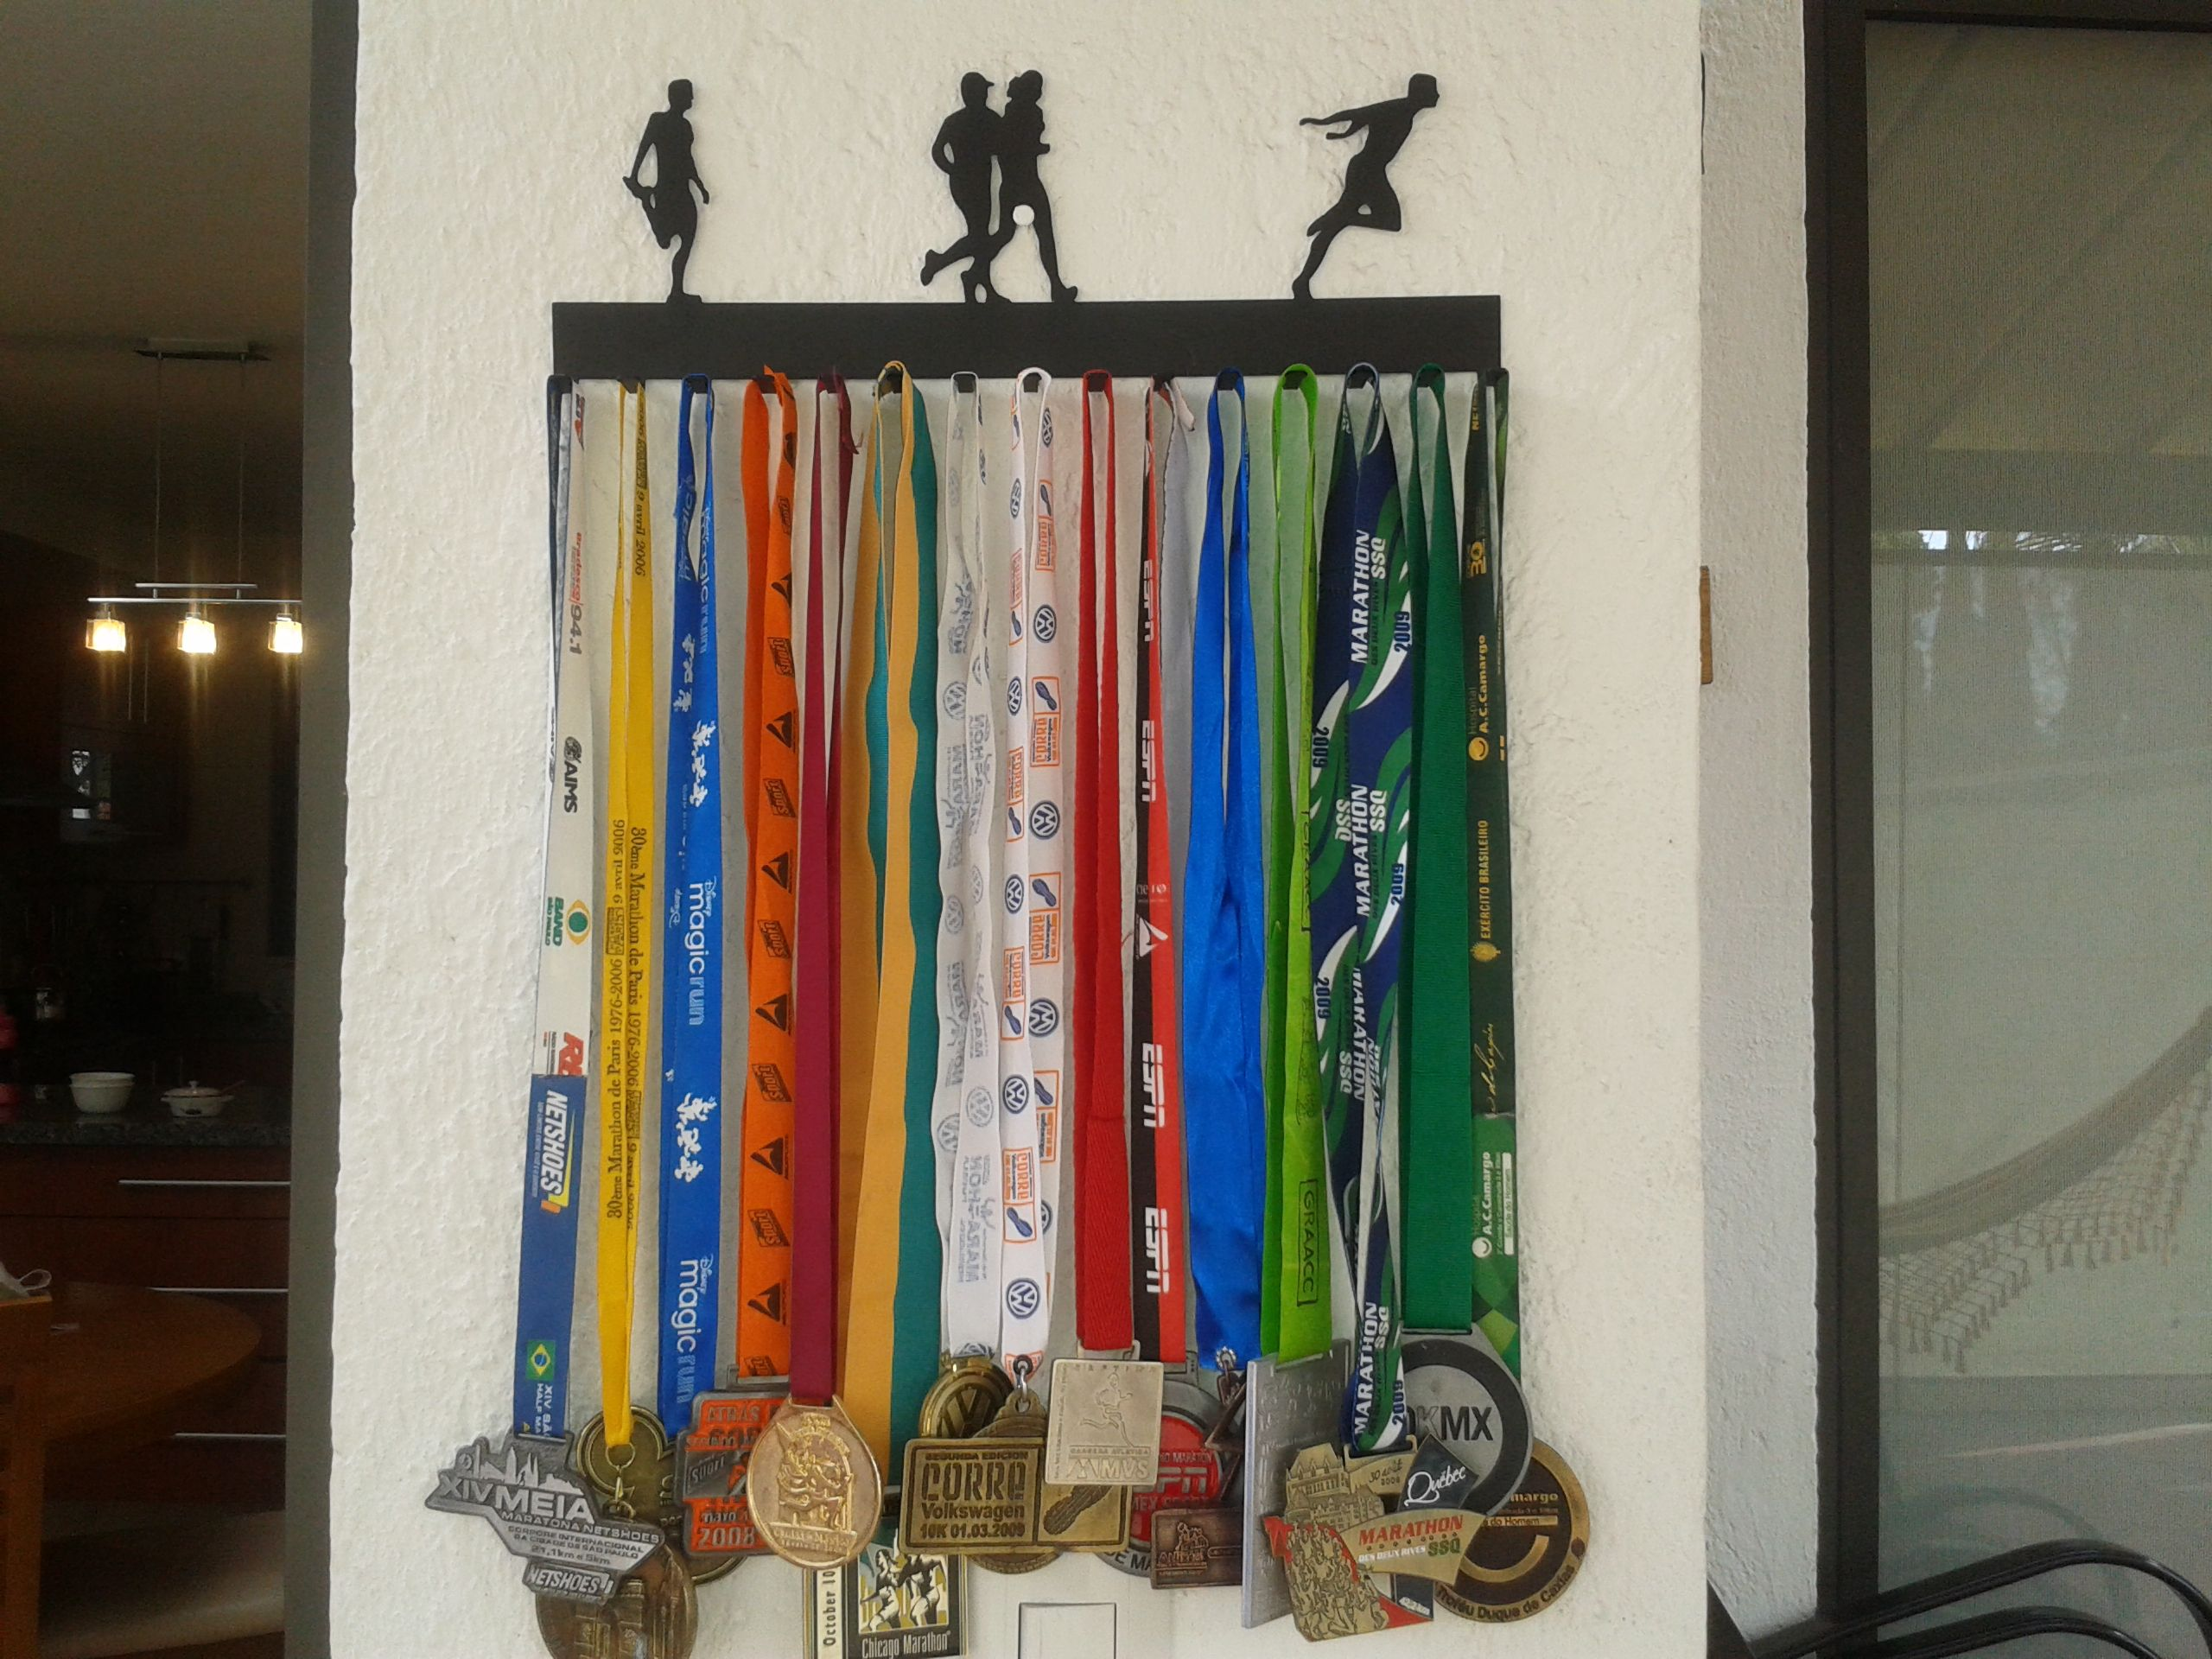 porta medallas corredor running pinterest corredores